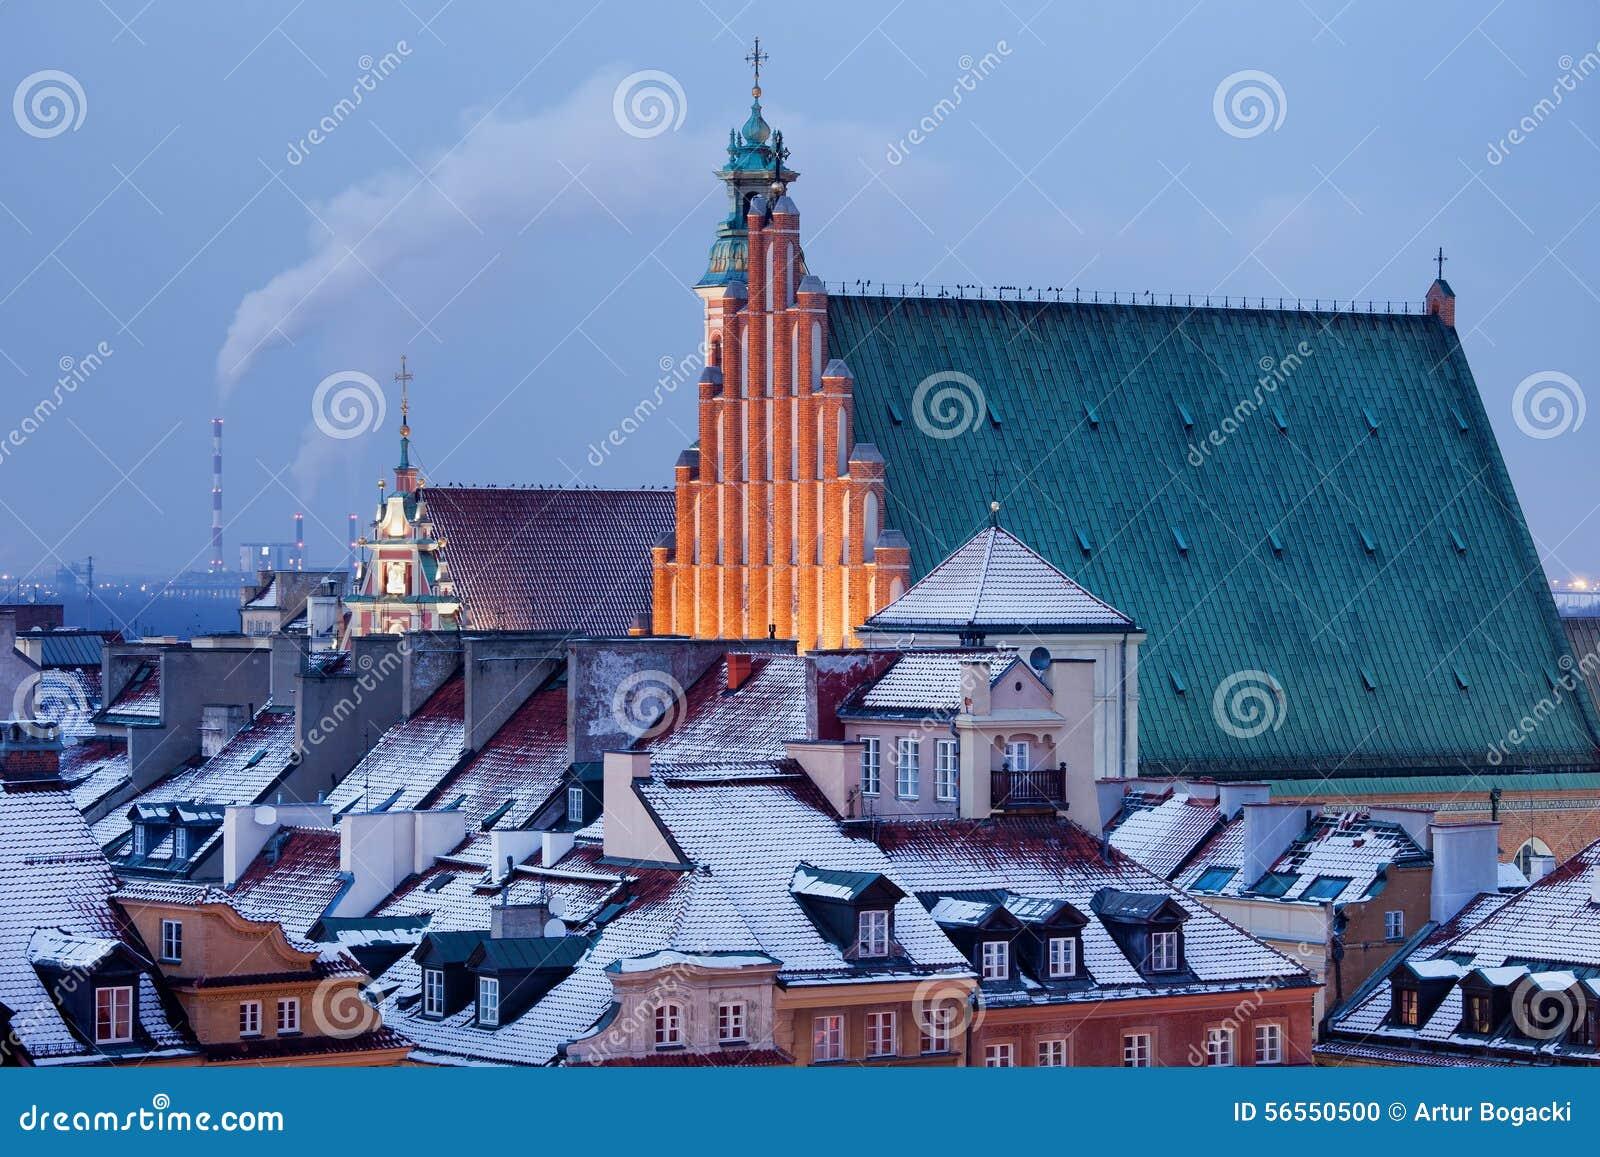 Download Παλαιά πόλη των χιονωδών στεγών της Βαρσοβίας το χειμώνα Στοκ Εικόνες - εικόνα από κορυφή, ευρώπη: 56550500